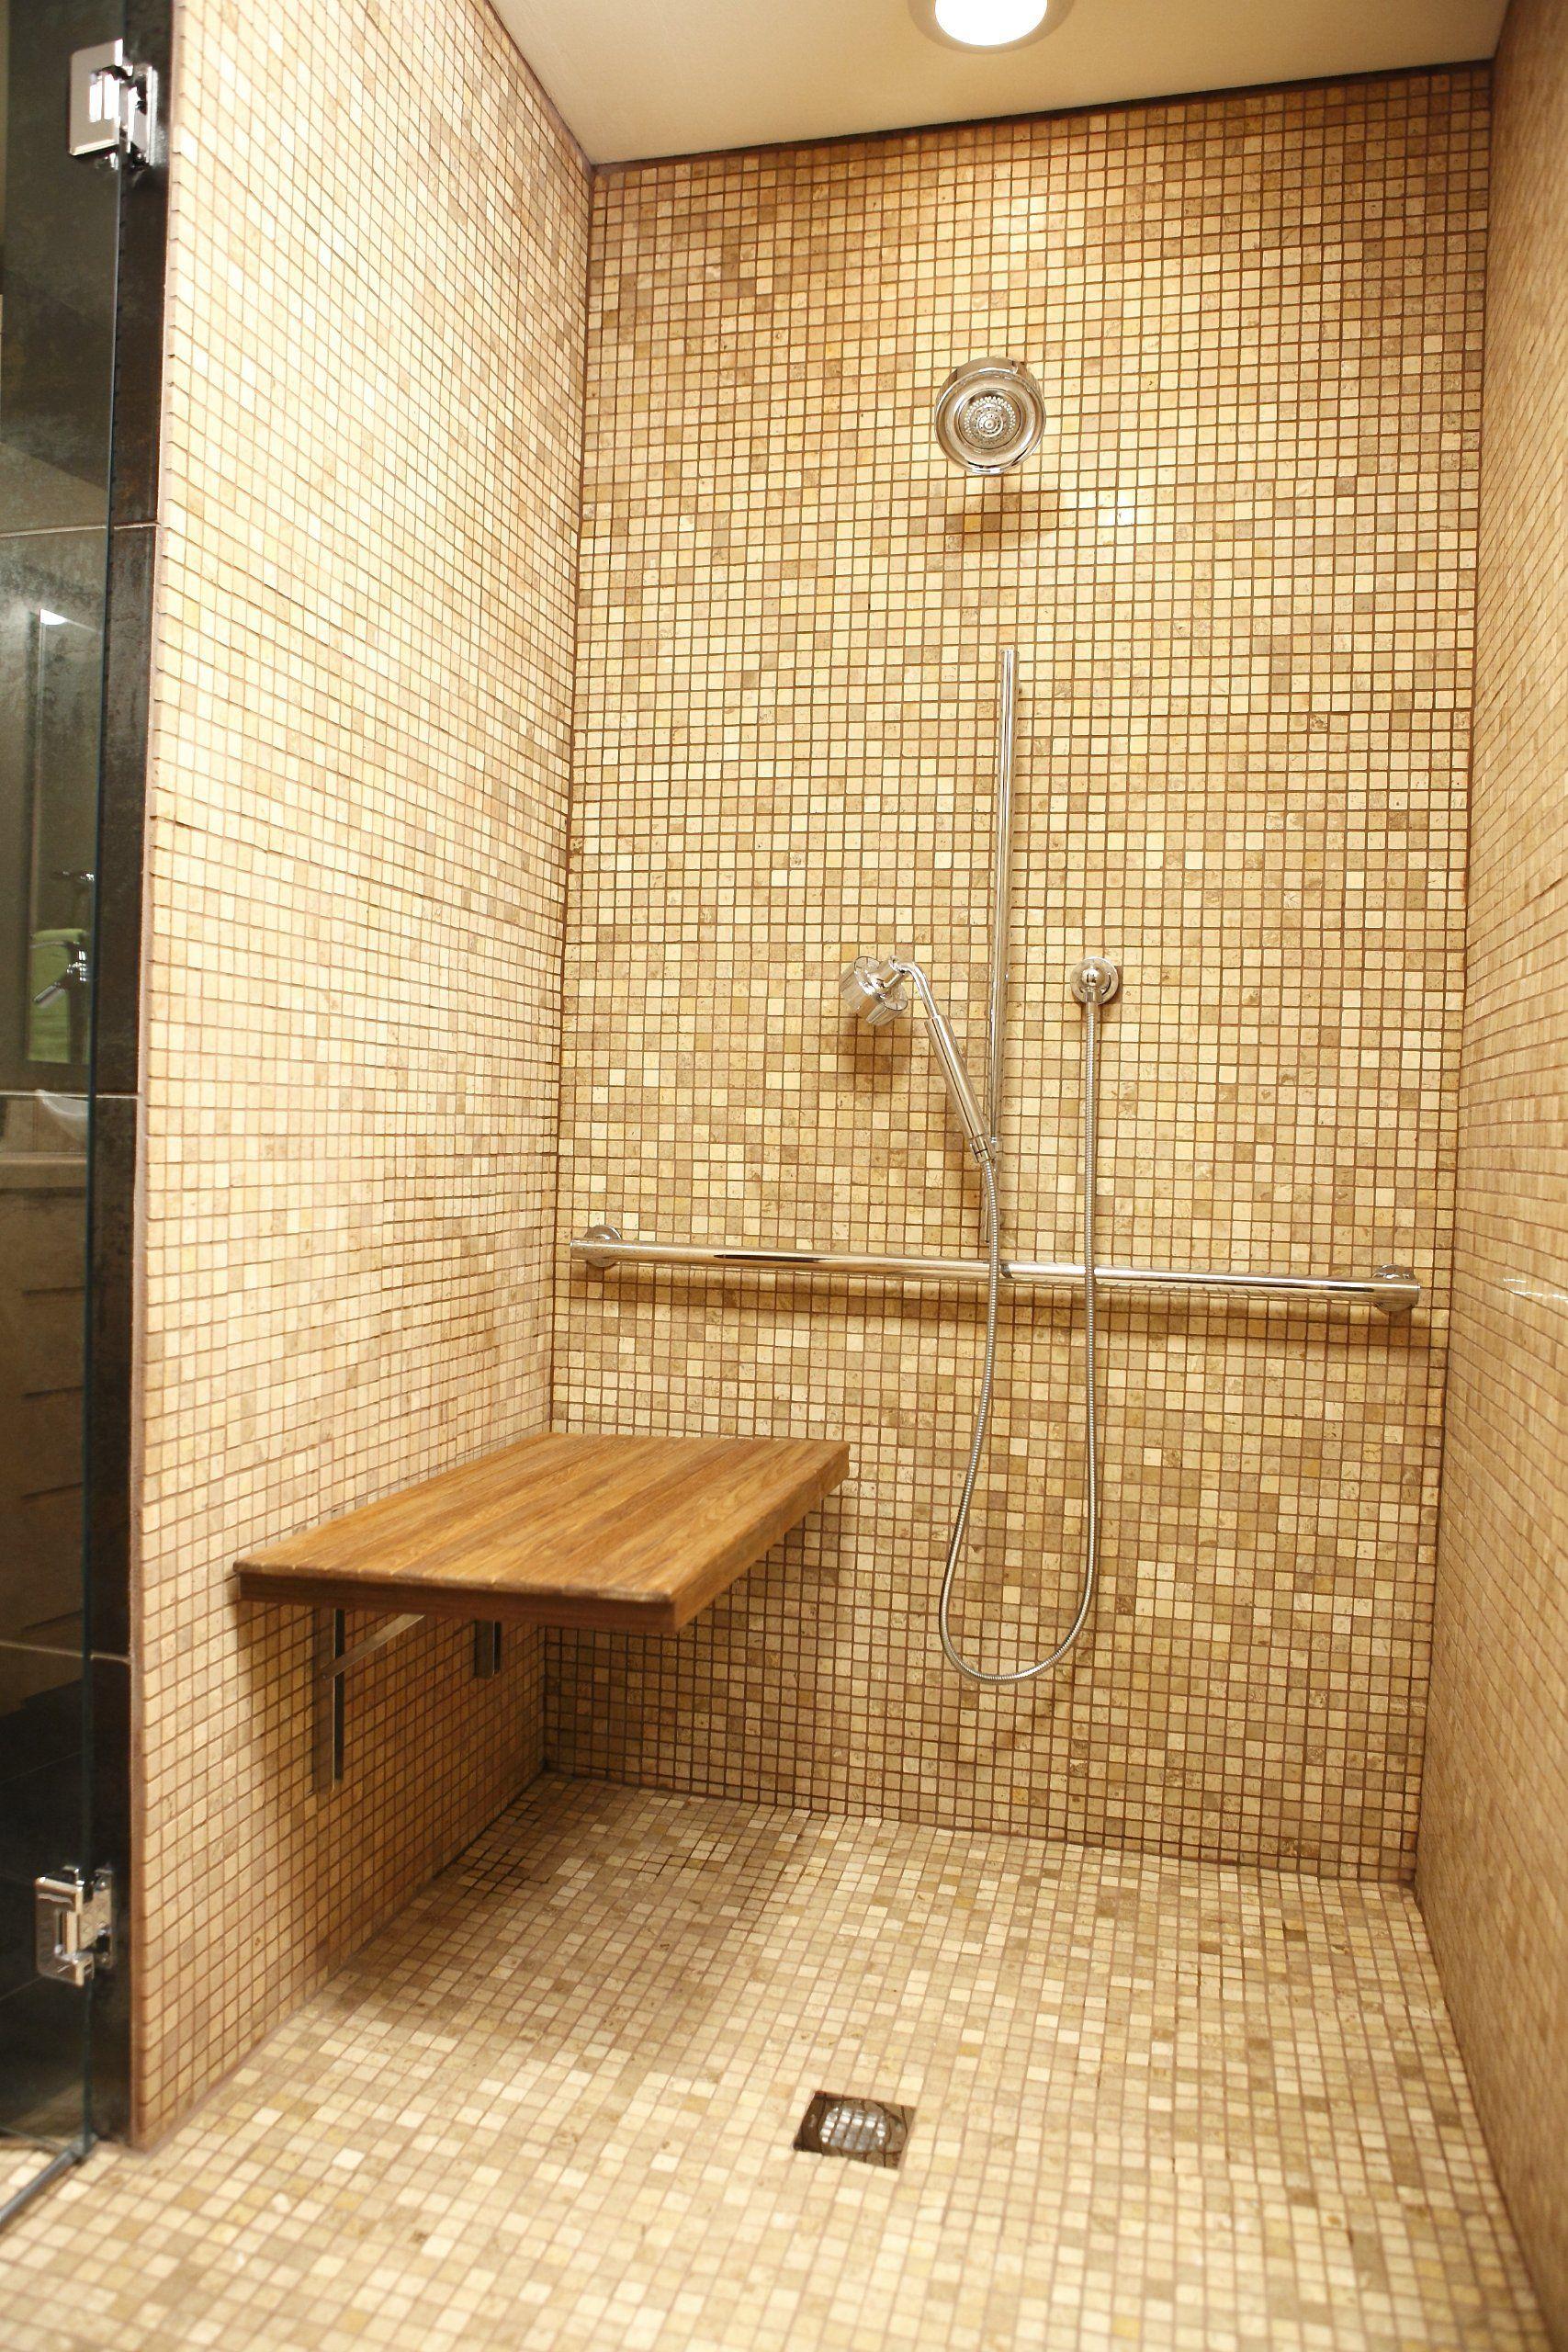 Teak Wall Mount Fold Down Shower Bench/Seat